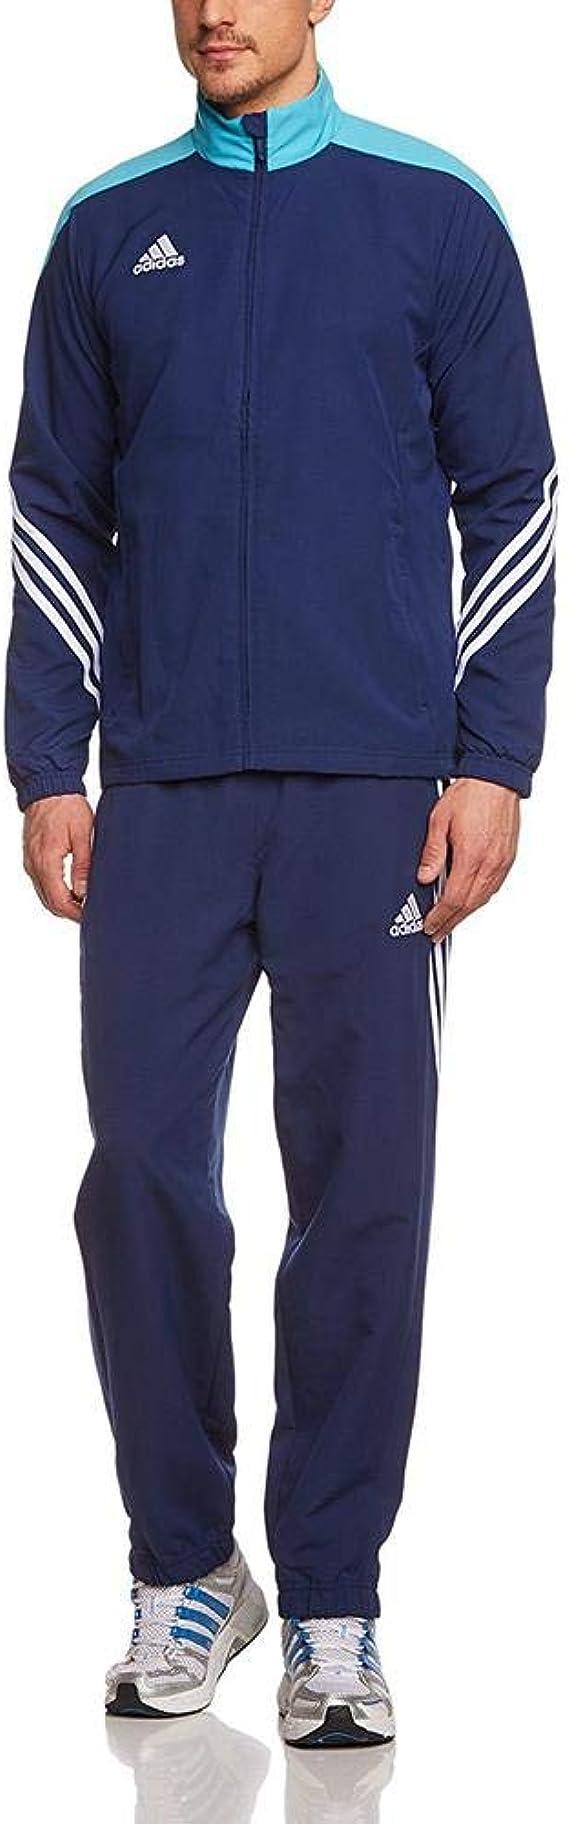 adidas Men's Sereno 14 Presentation Suit (Small, Dark BlueSupcyaWhite)